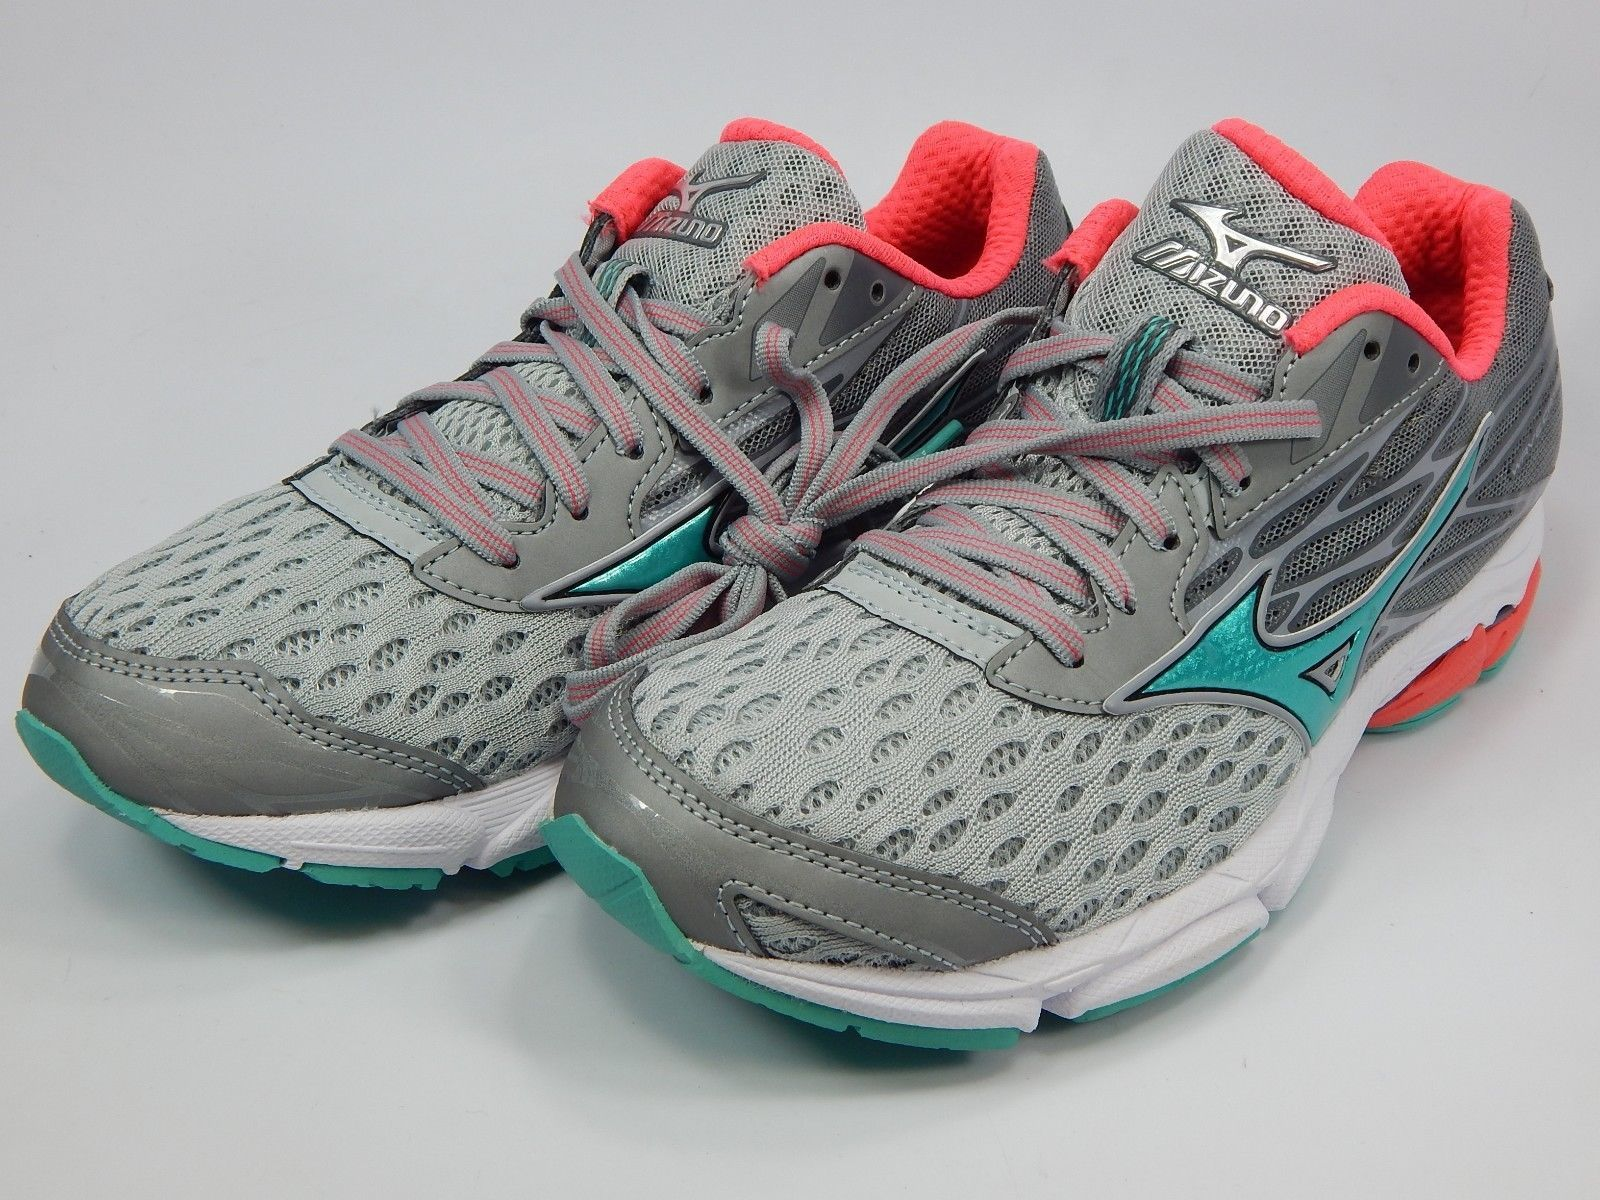 Mizuno Wave Catalyst 2 Size US 8 M (B) EU 38.5 Women's Running Shoes Silver